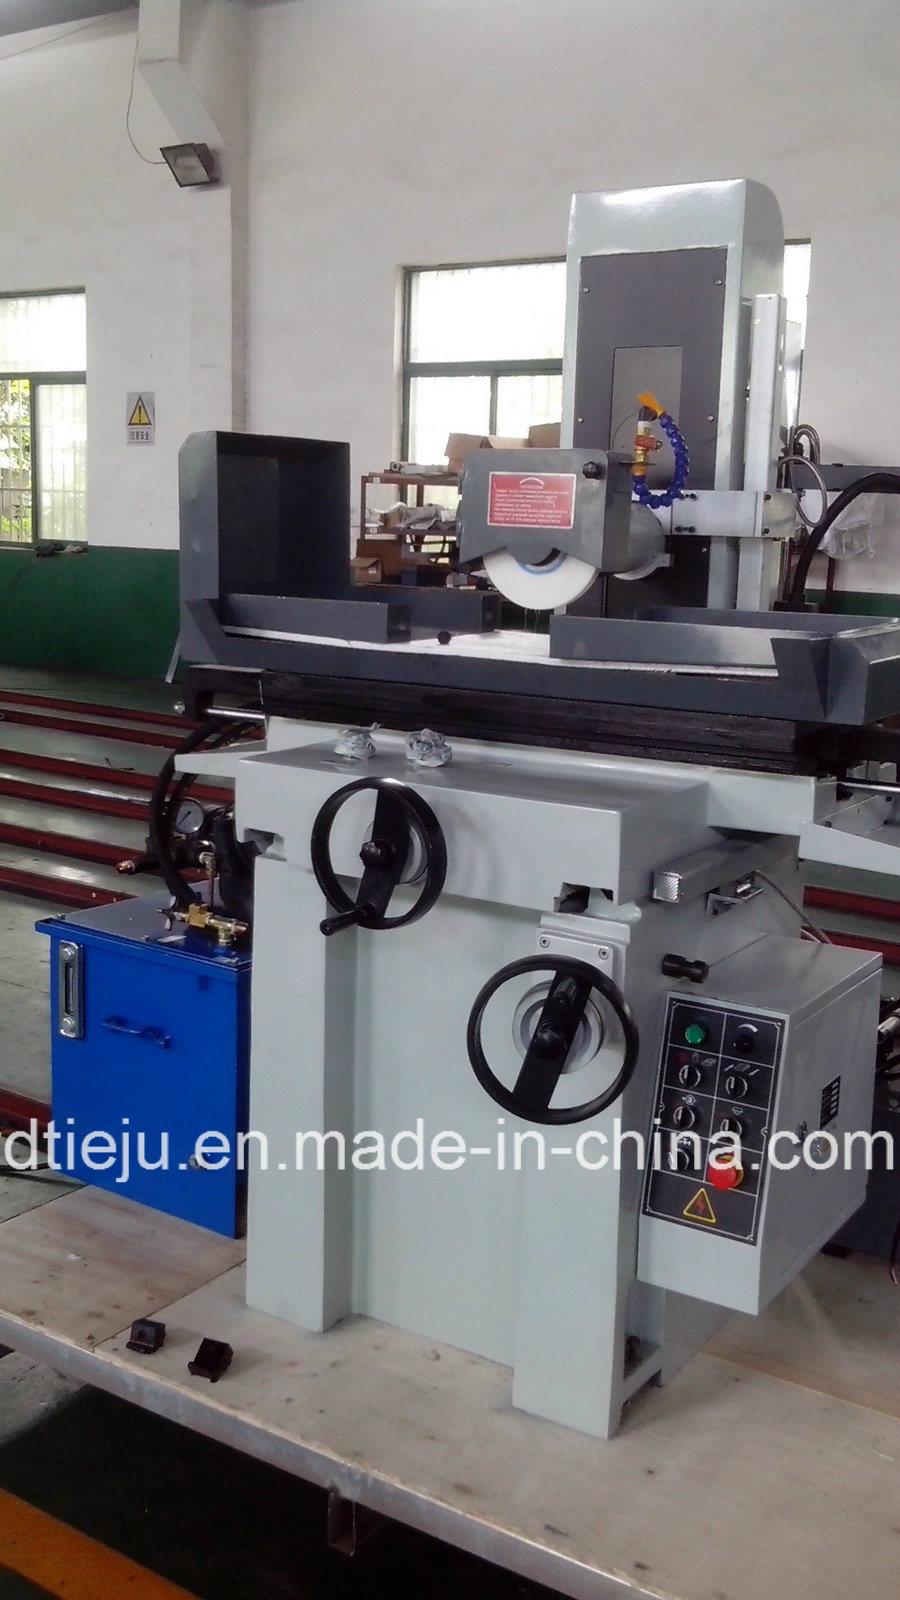 Hydraulic Surface Grinding Machine My1022 (540*250mm)